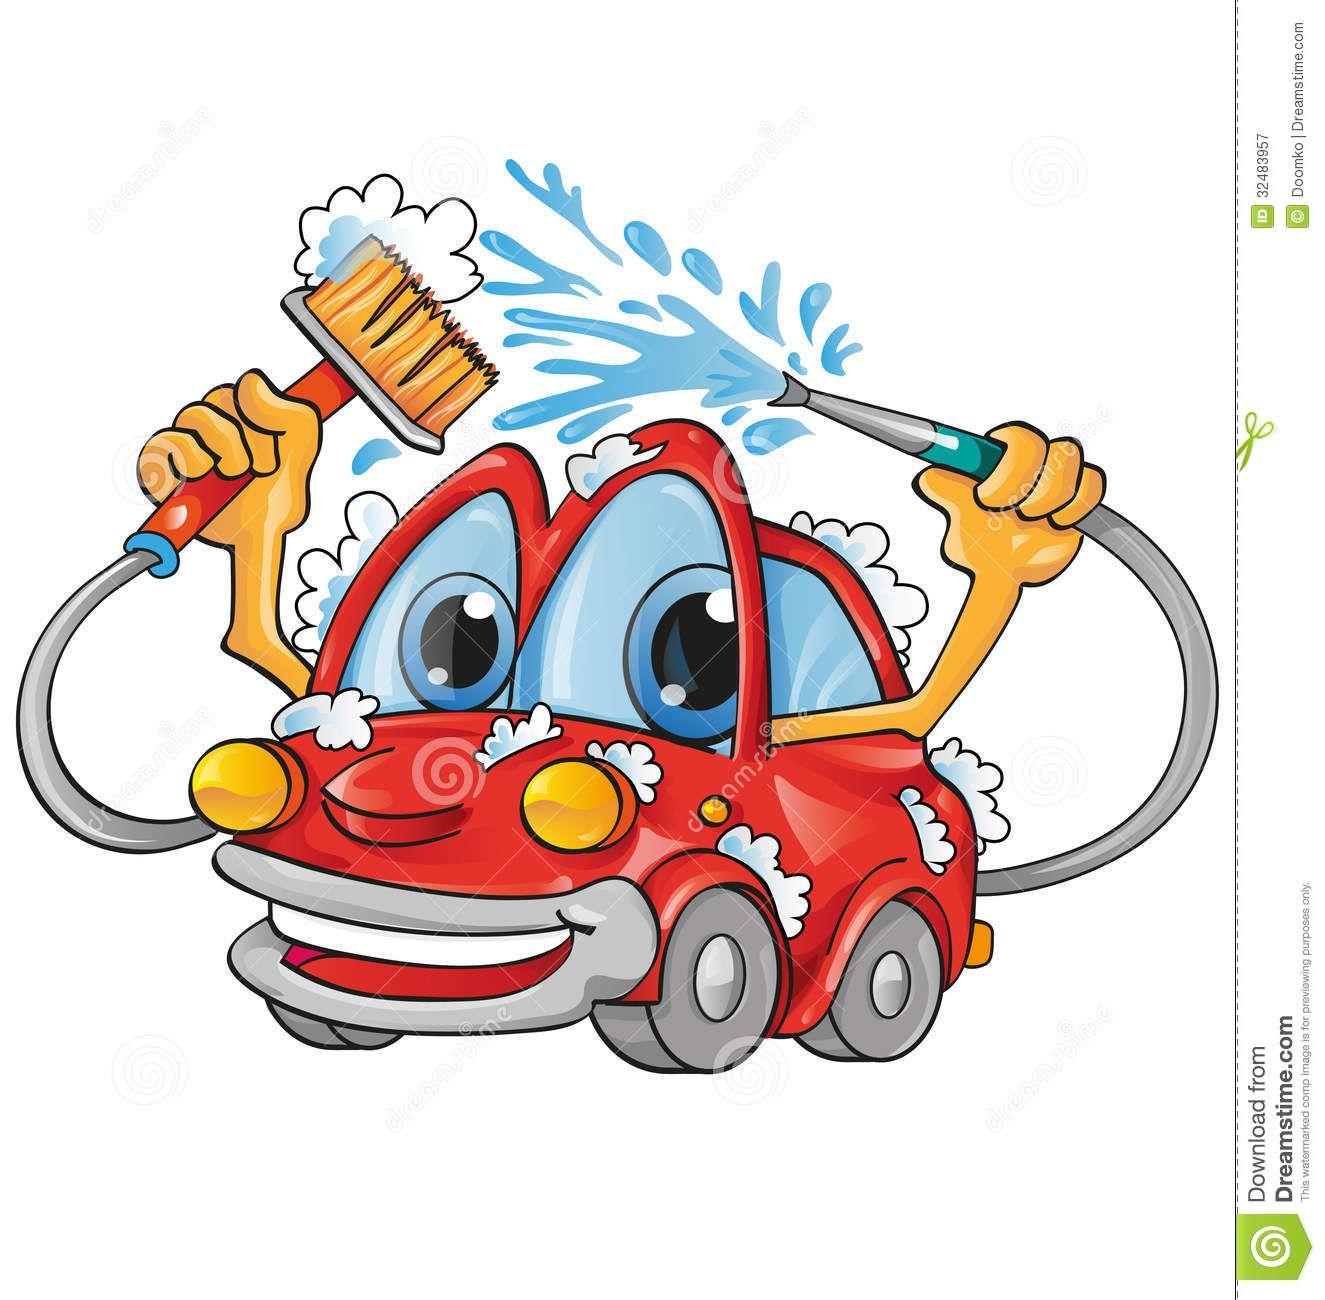 Pin By Shuqing Xu On Kids And Parenting Car Wash Sign Car Wash